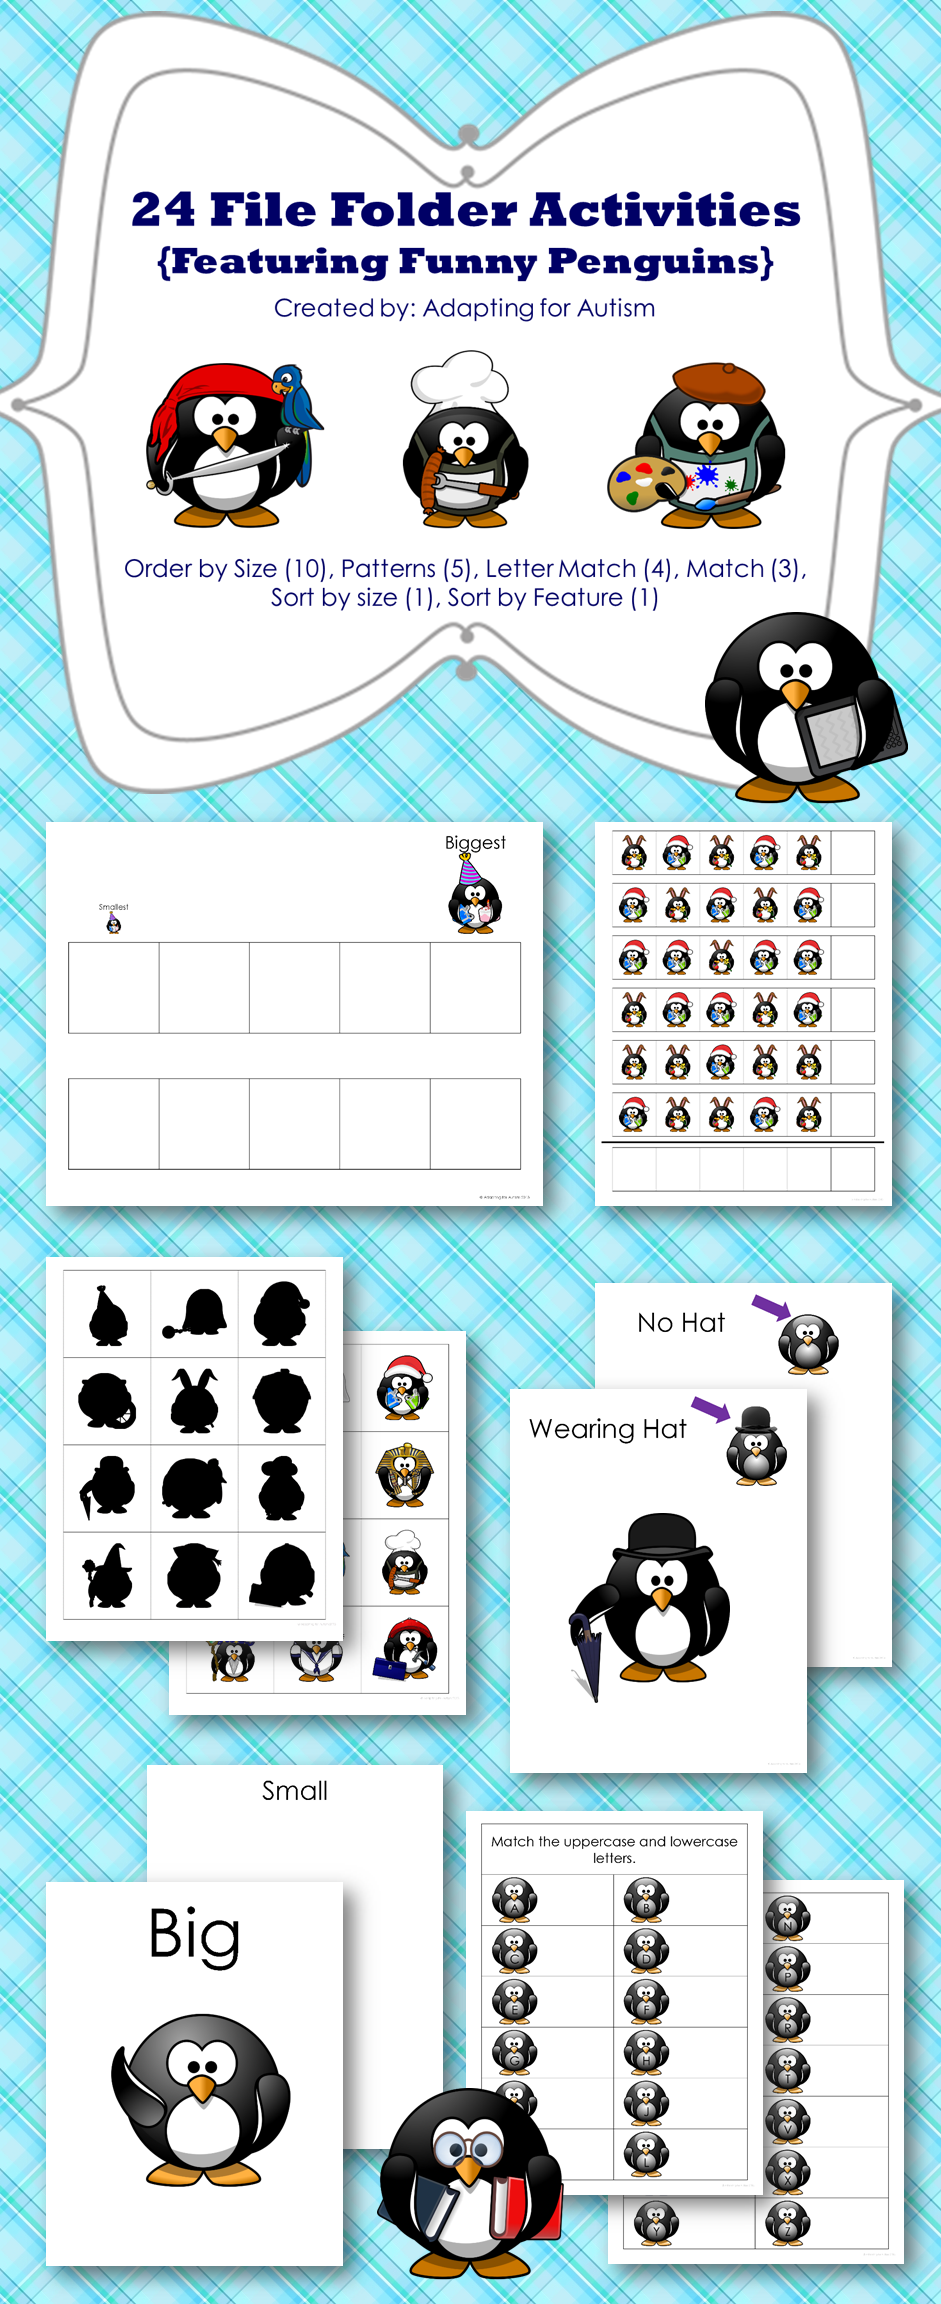 Autism File Folder Activities: Patterning, Sorting, Ordering ...